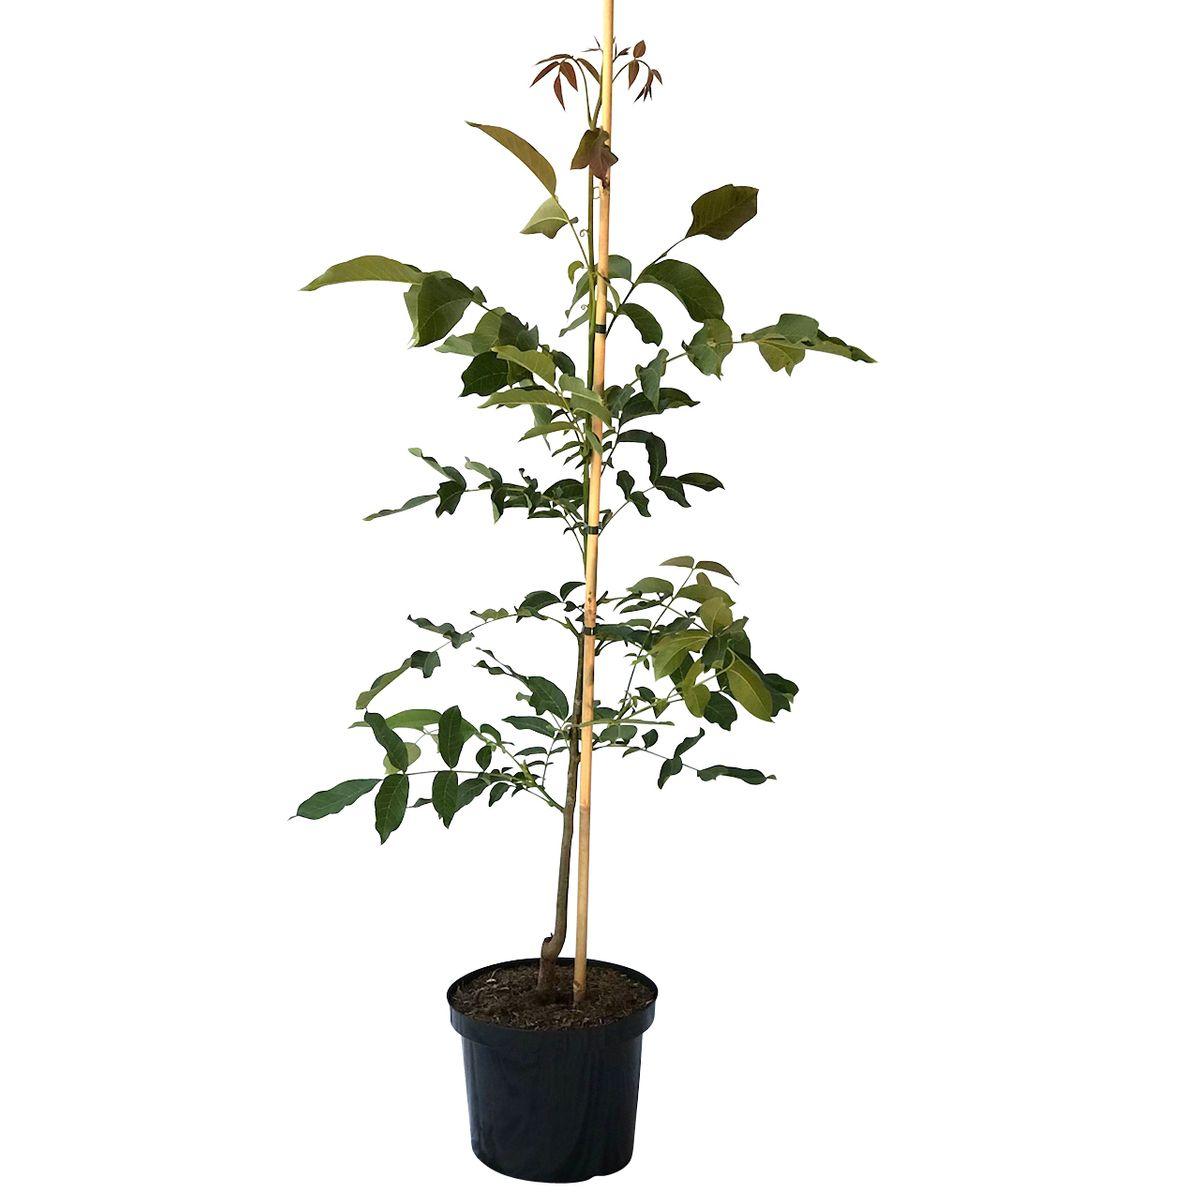 walnussbaum als s mling besonders kr ftig und robust 120 170 cm 10 liter topf ebay. Black Bedroom Furniture Sets. Home Design Ideas